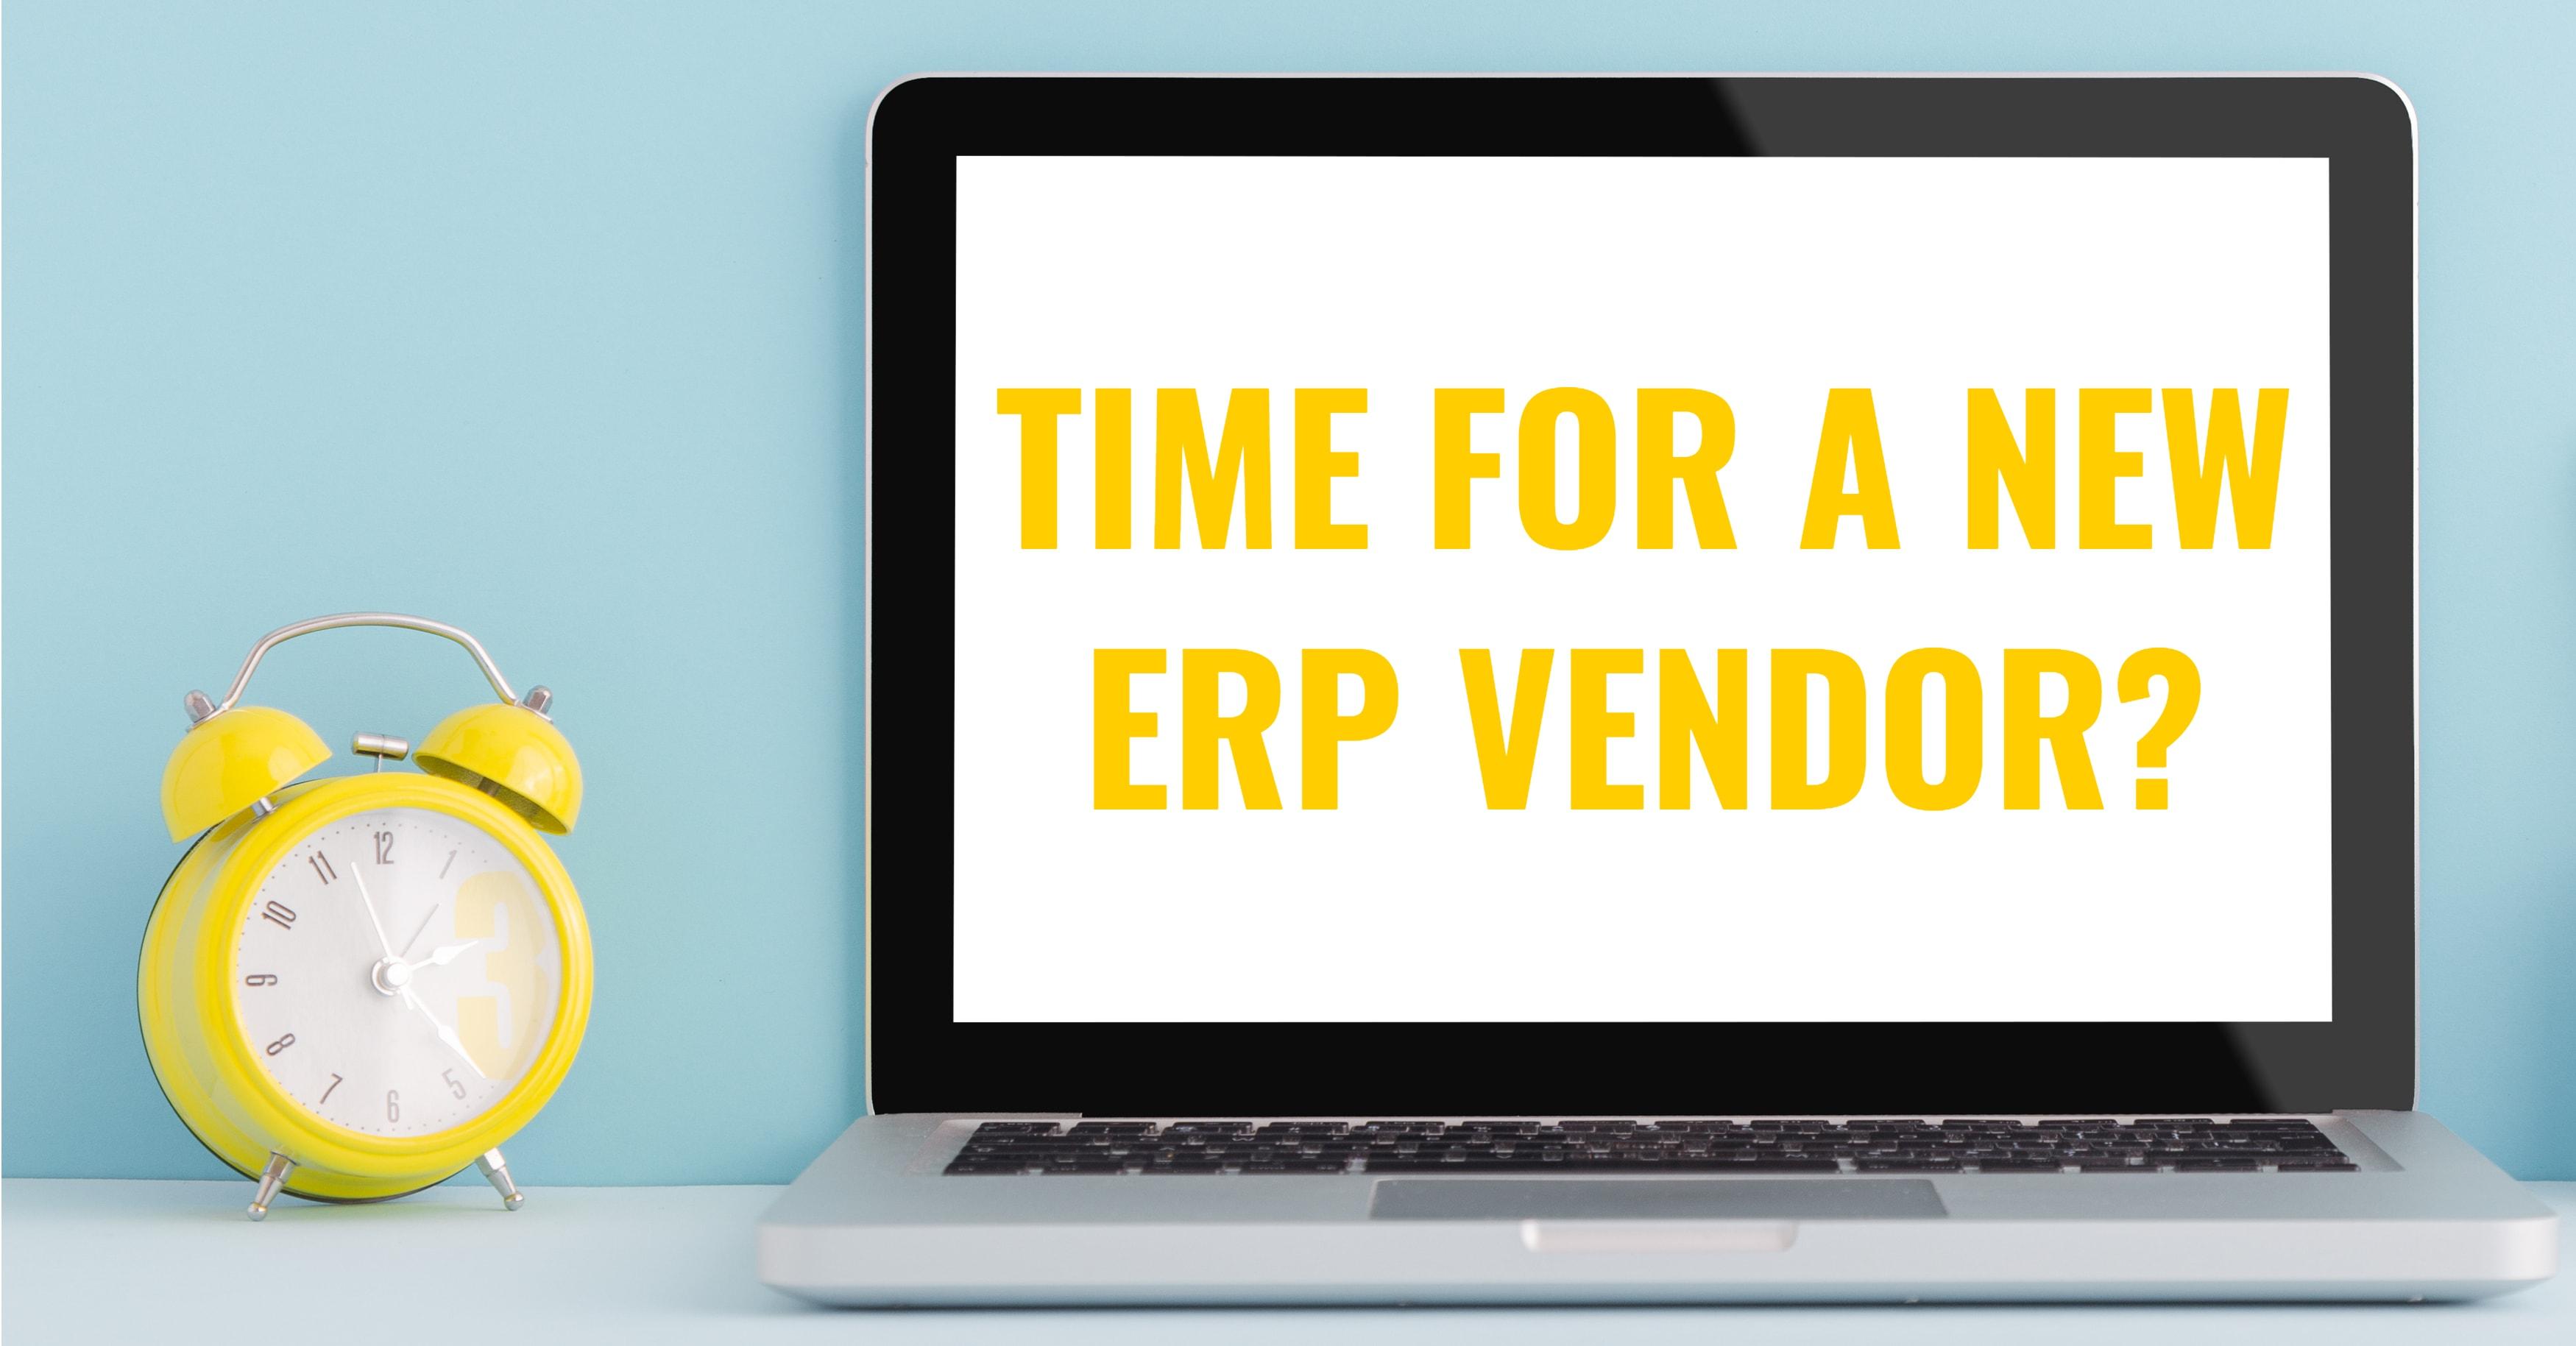 New ERP Vendor